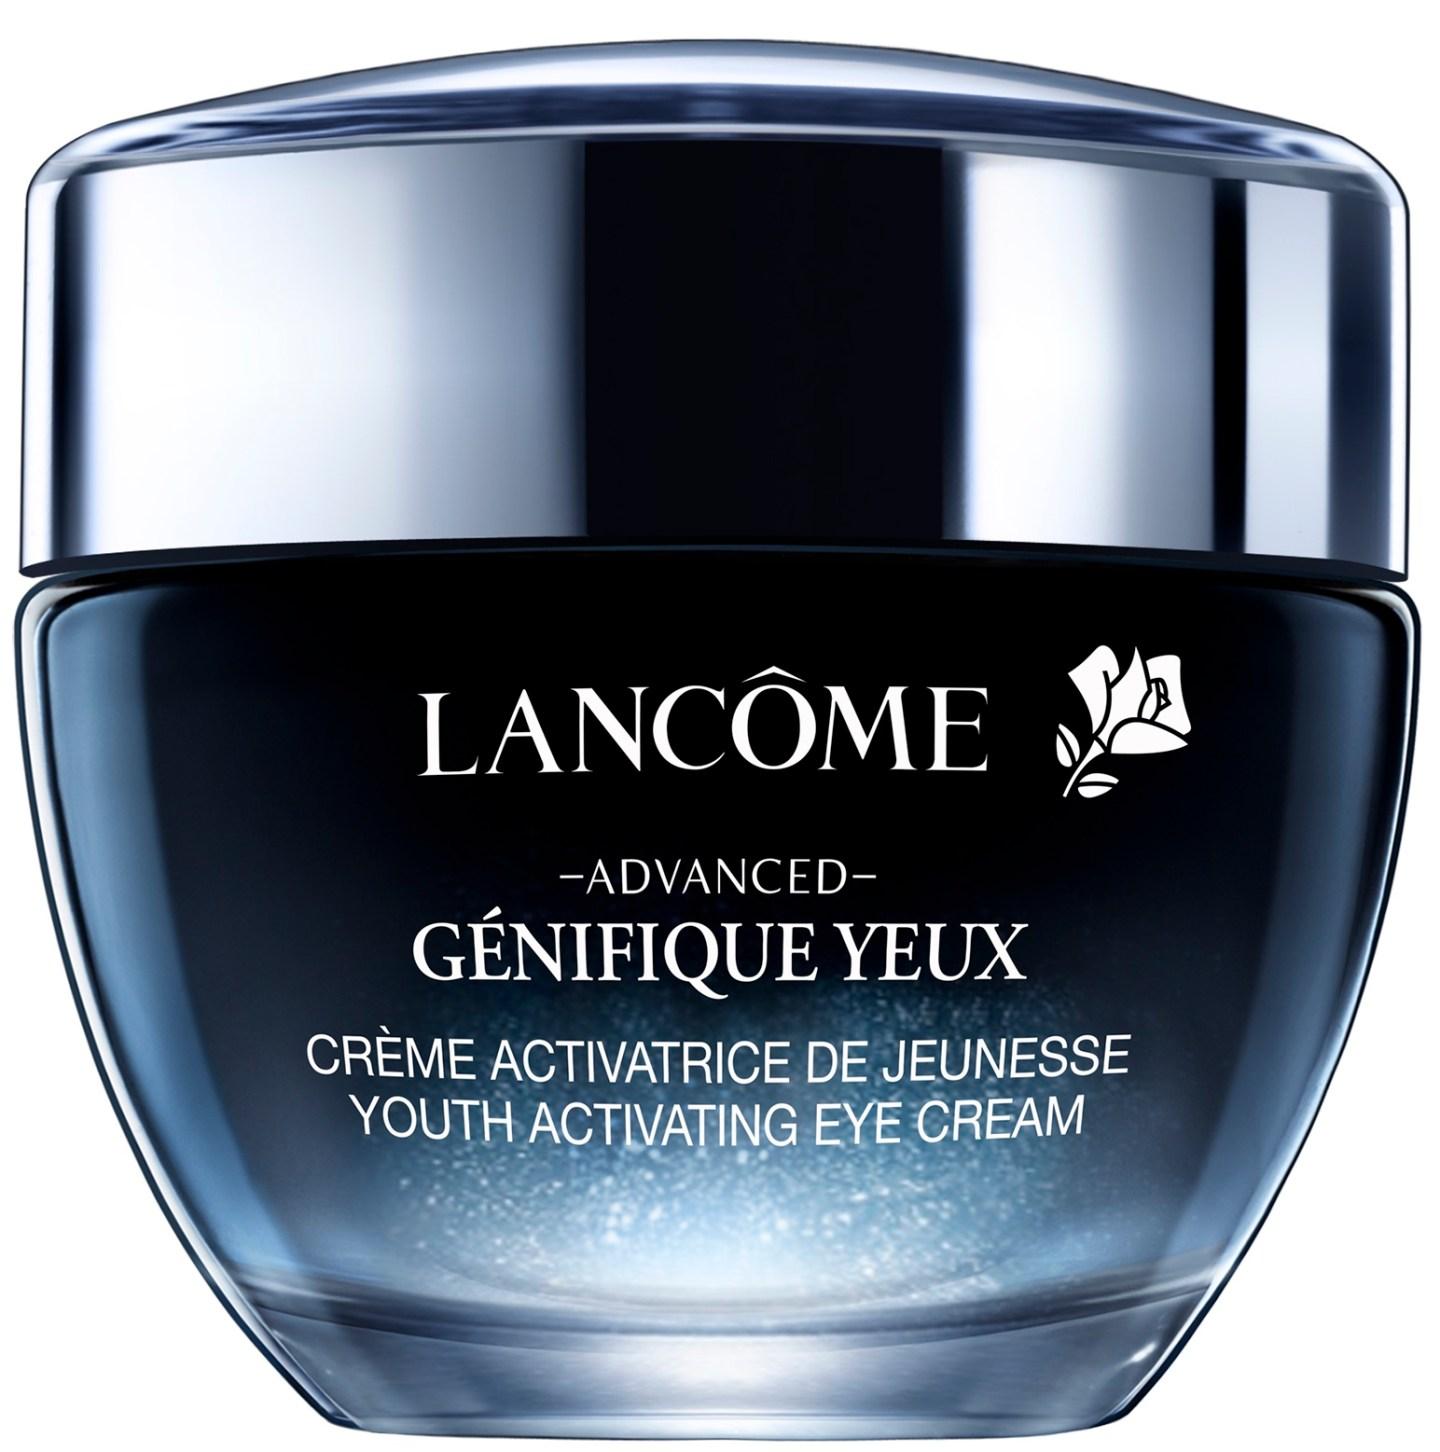 Lancôme's Adds New Eye Cream to Advanced Génefique Collection